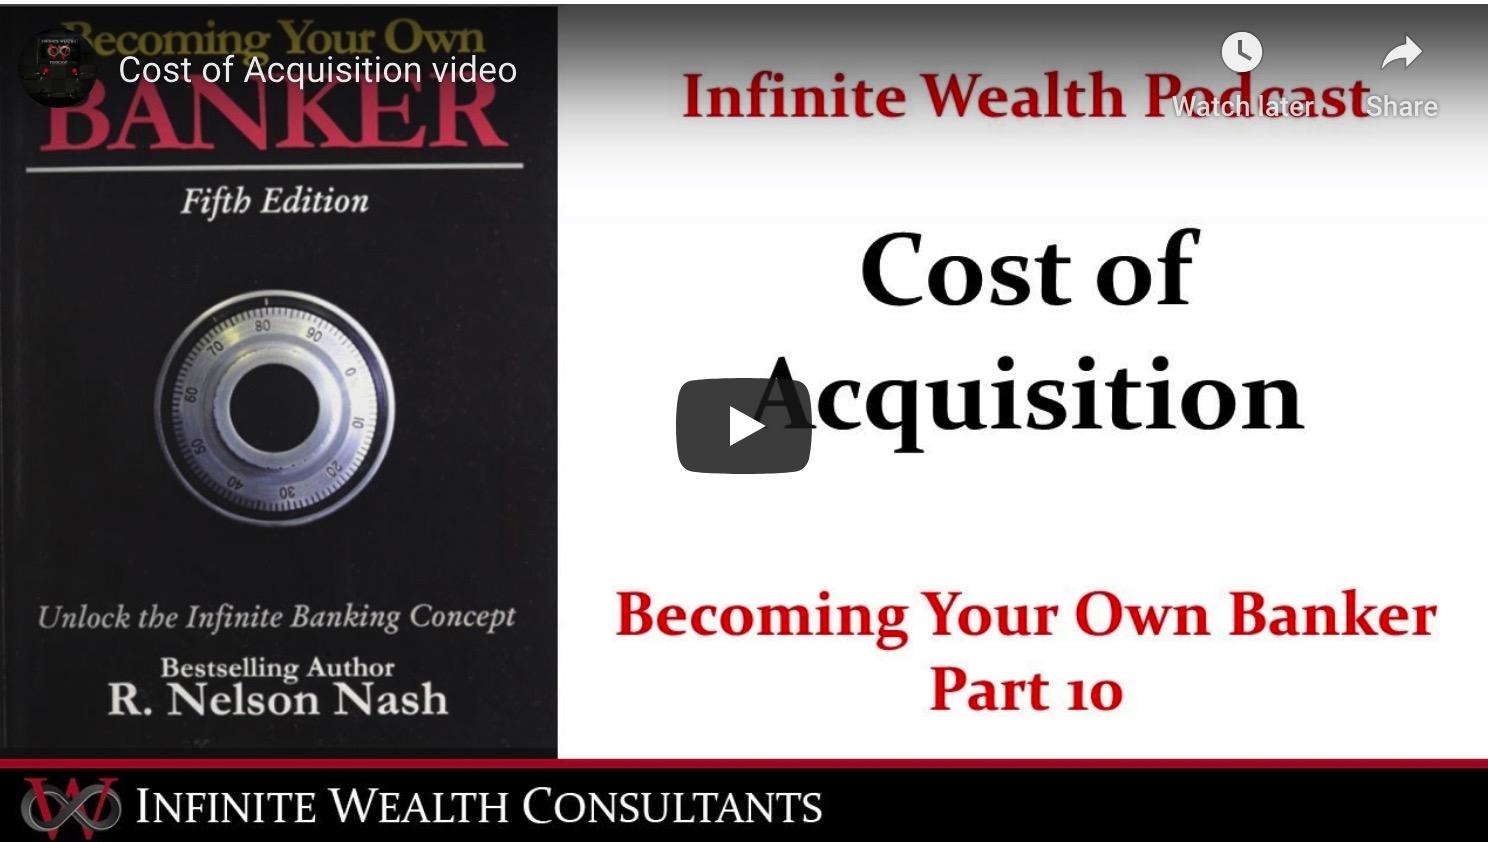 Investment advise